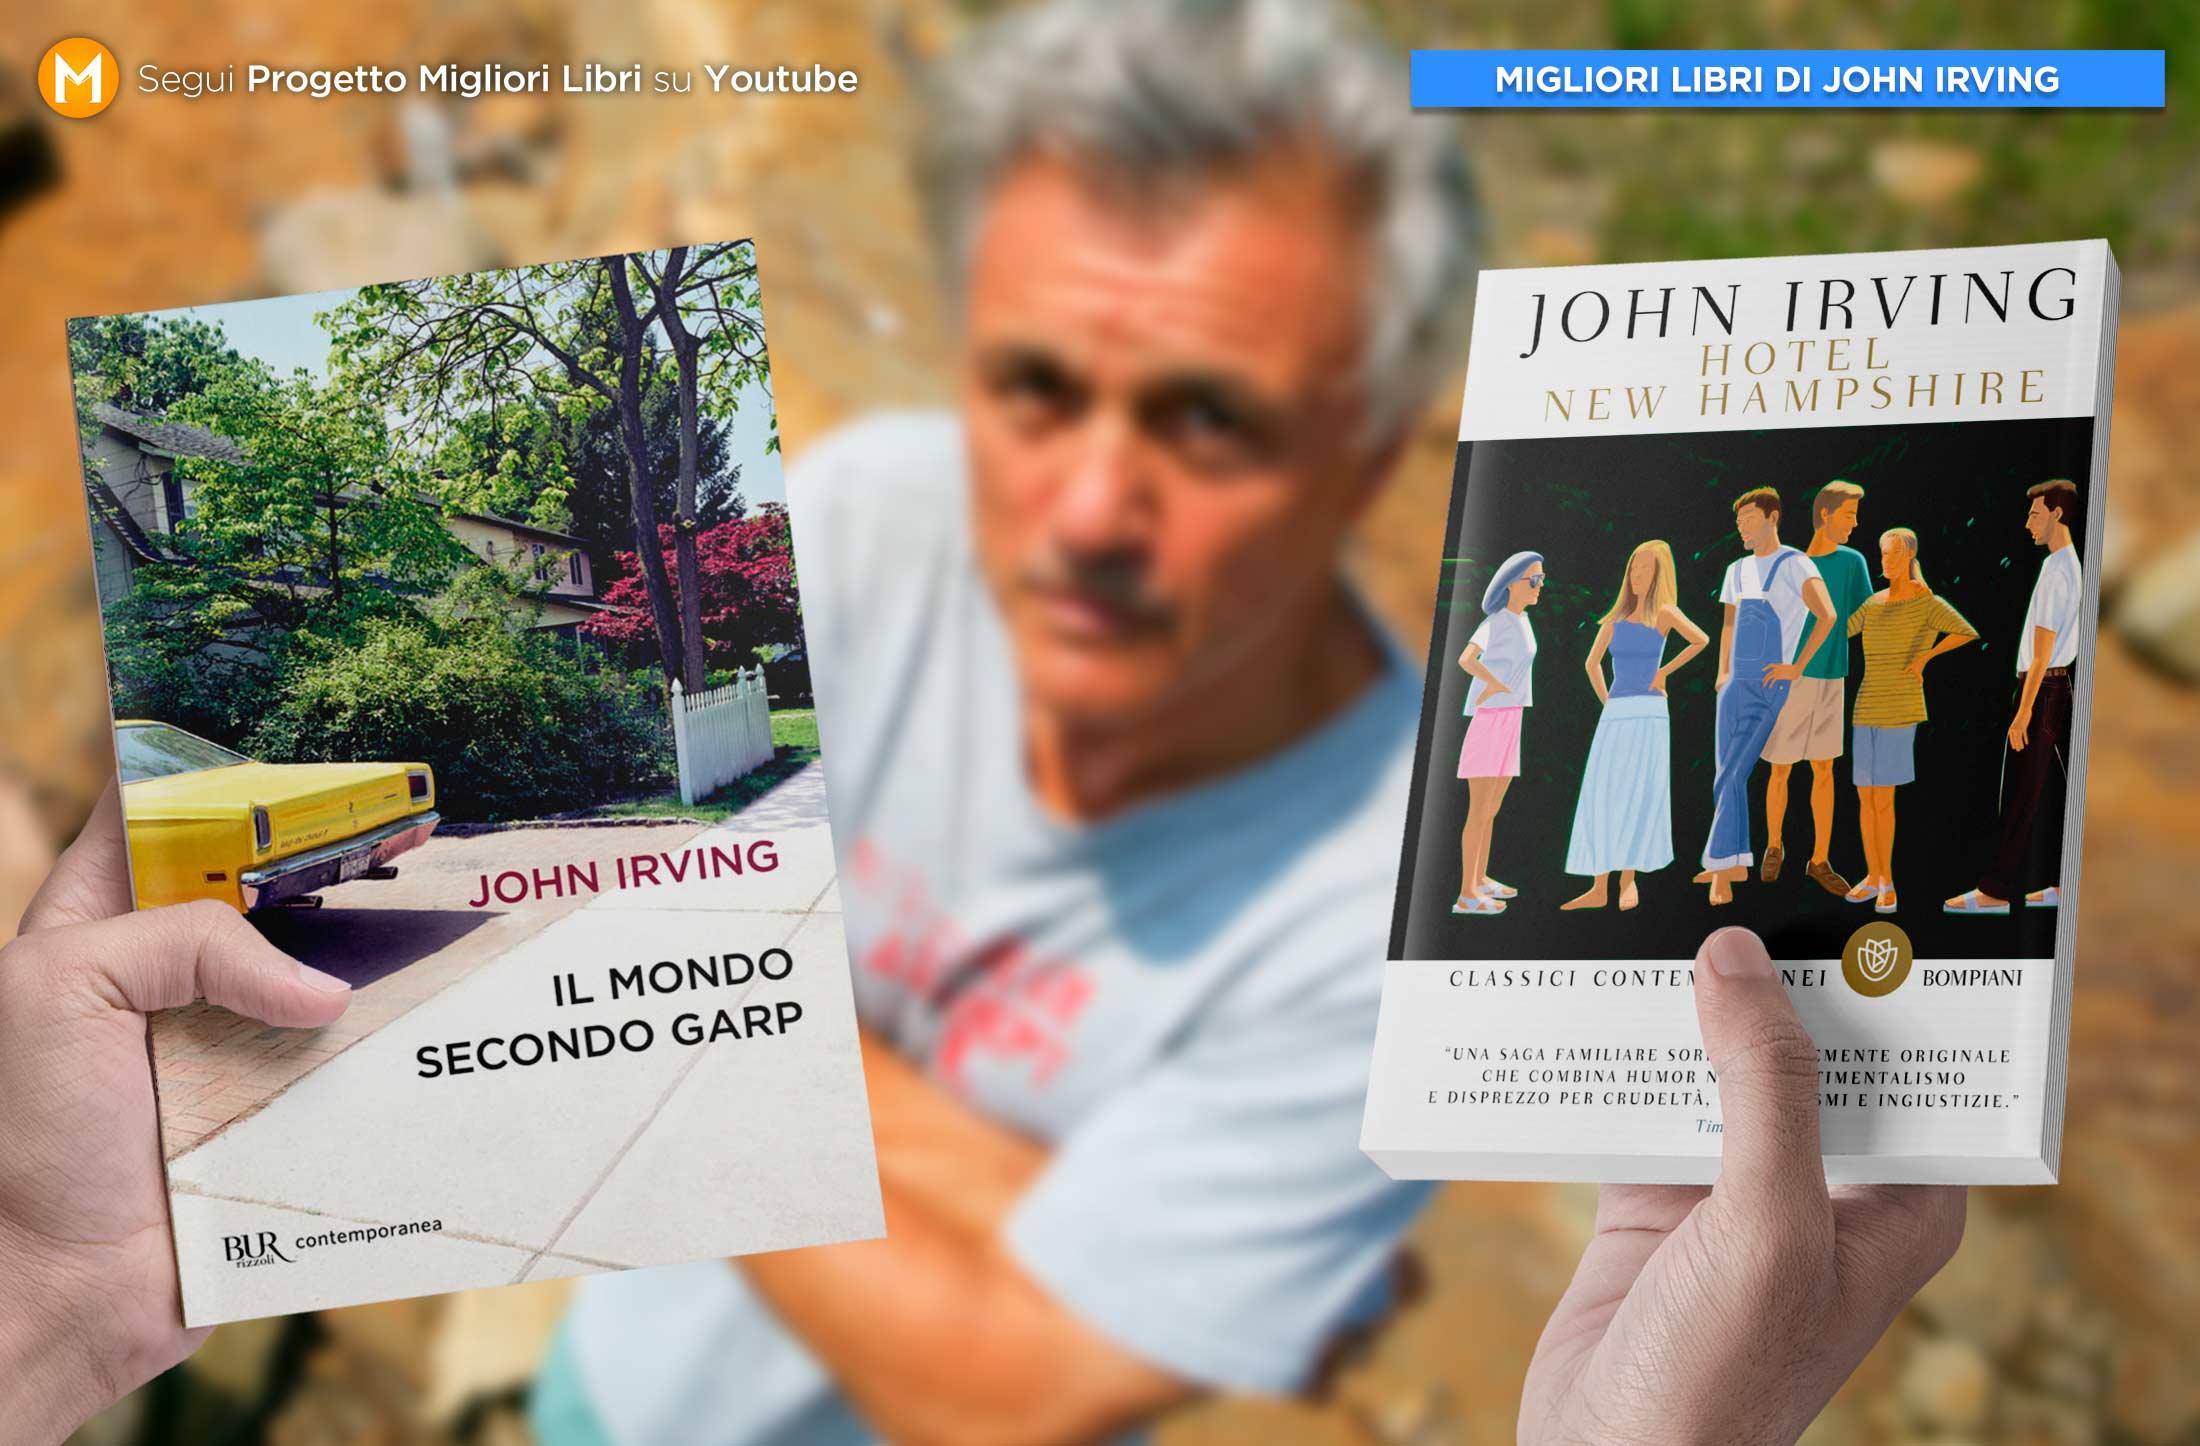 migliori-libri-di-john-irving